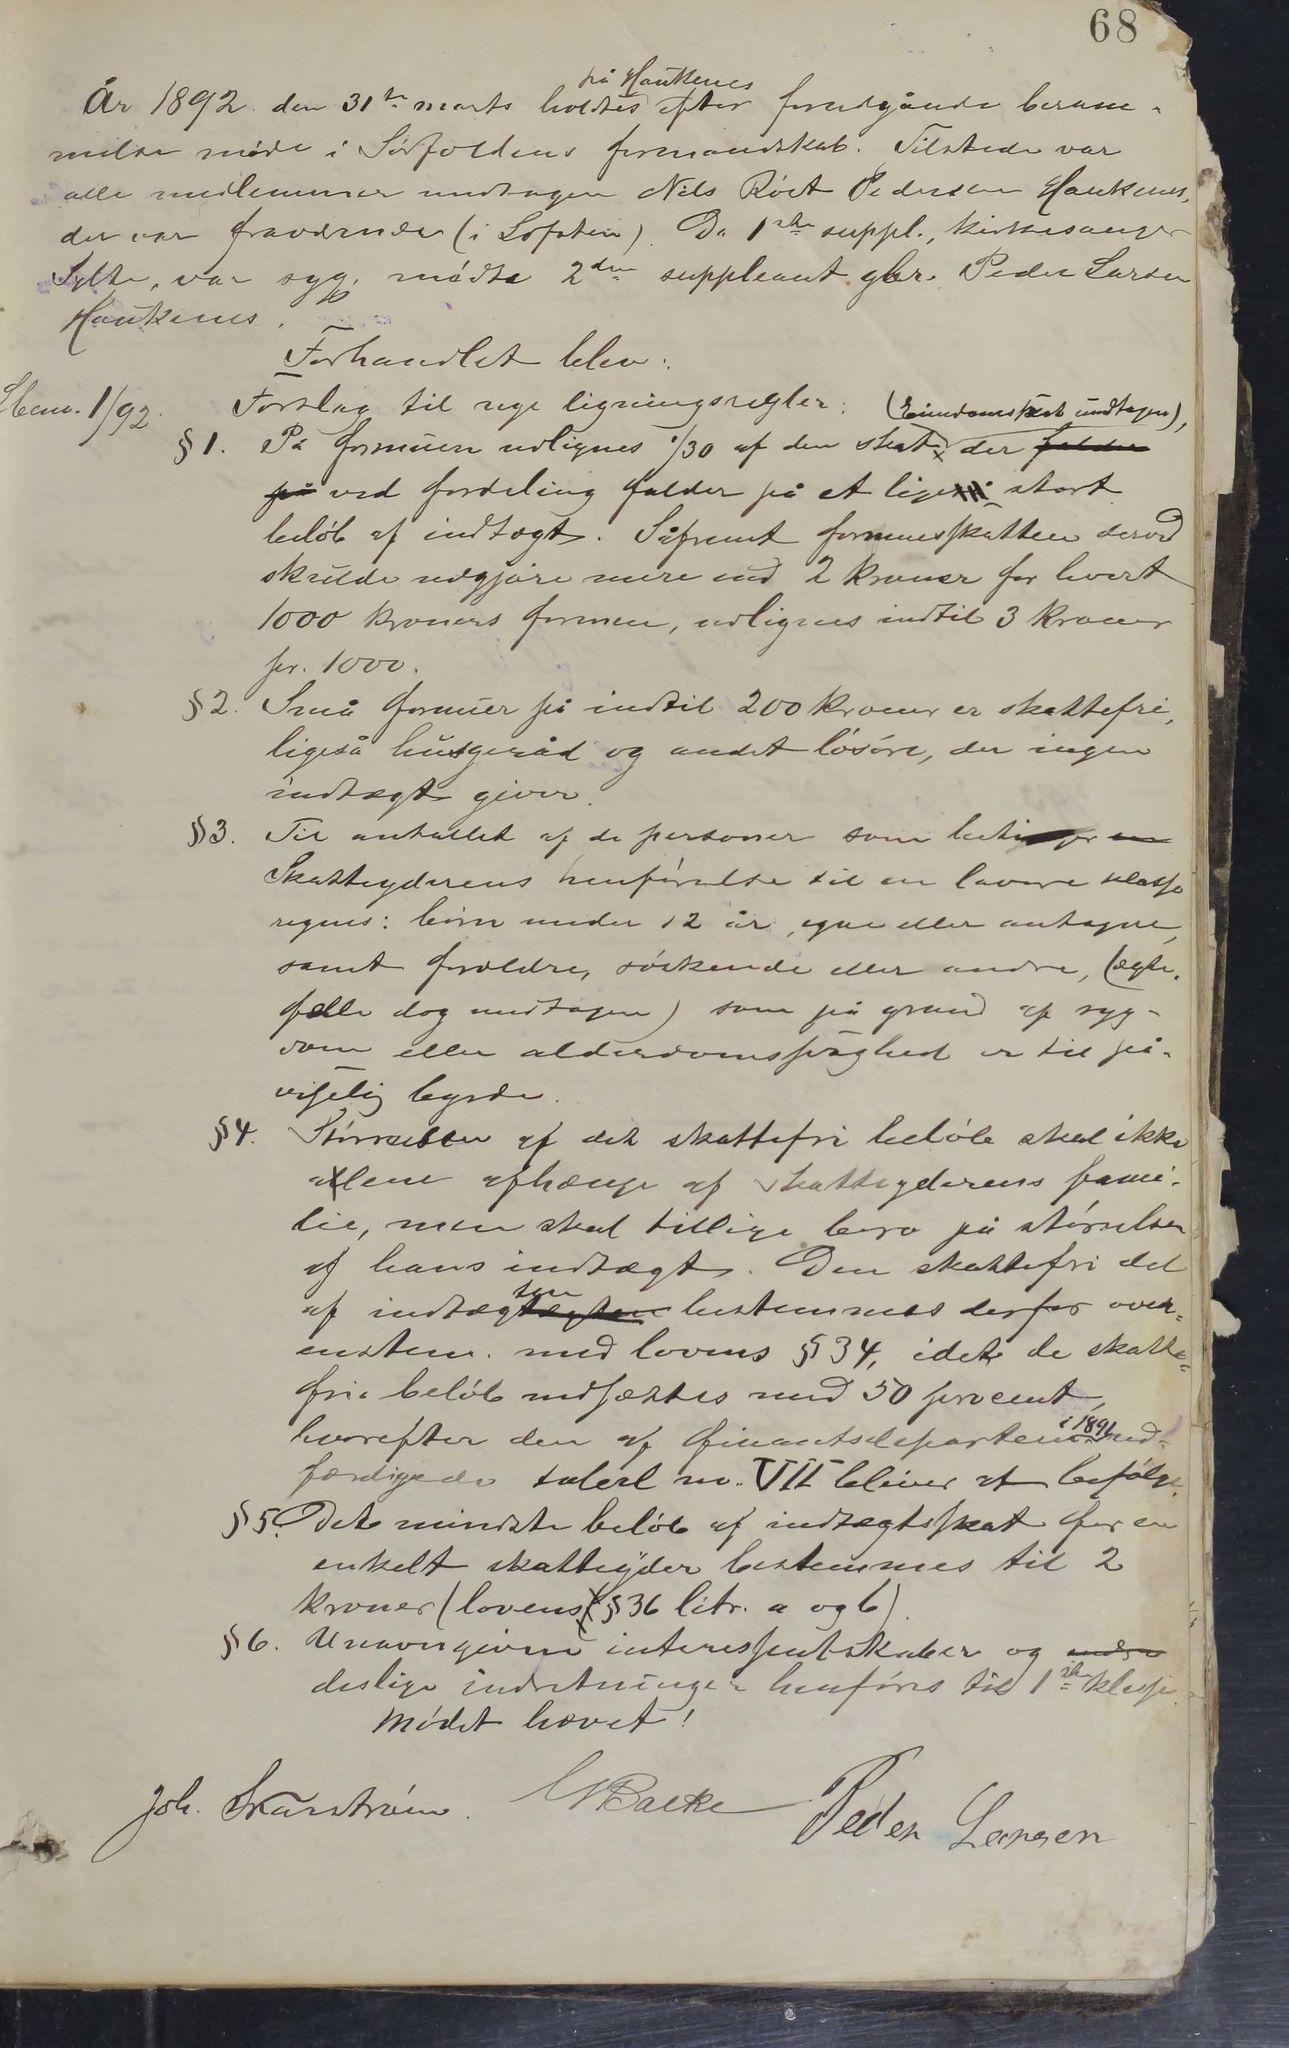 AIN, Sørfold kommune. Formannskap, 100/L0001: Forhandlingsprotokol for Sørfoldens formandskab, 1885-1902, s. 68